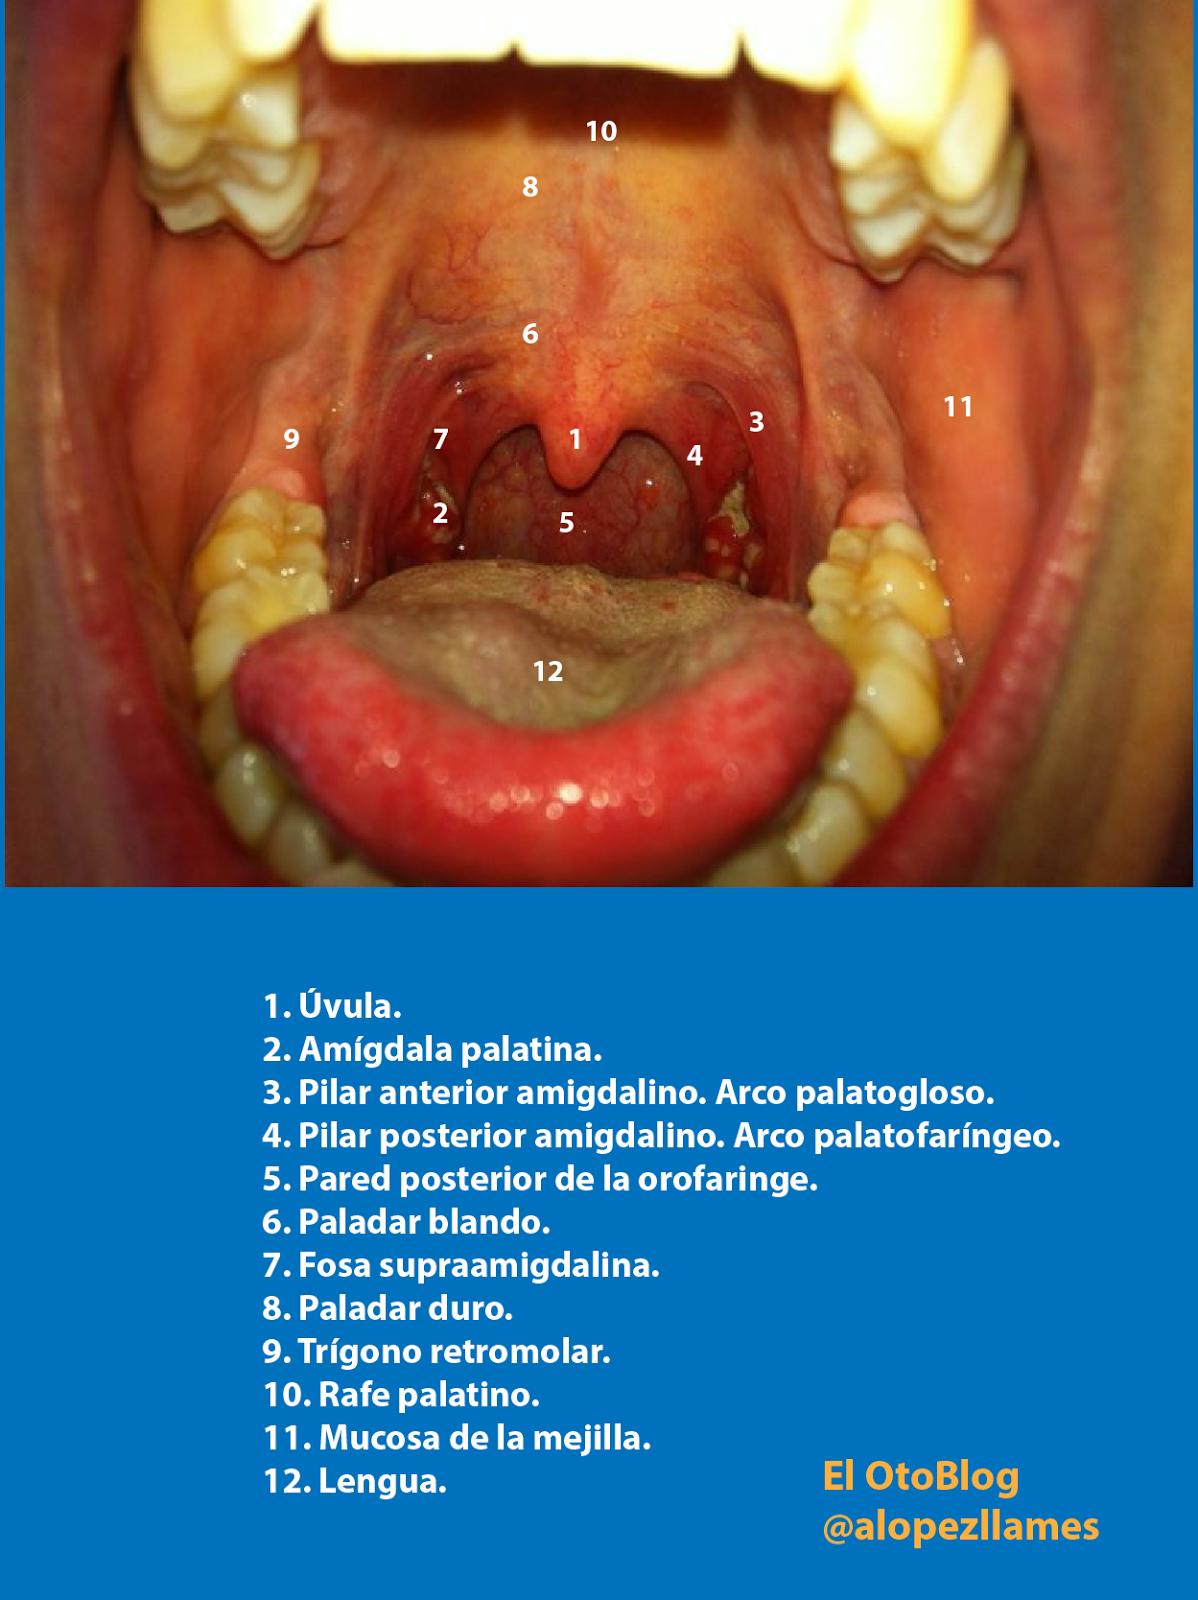 El OtoBlog: Abra la boca, pero...¿saque la lengua?